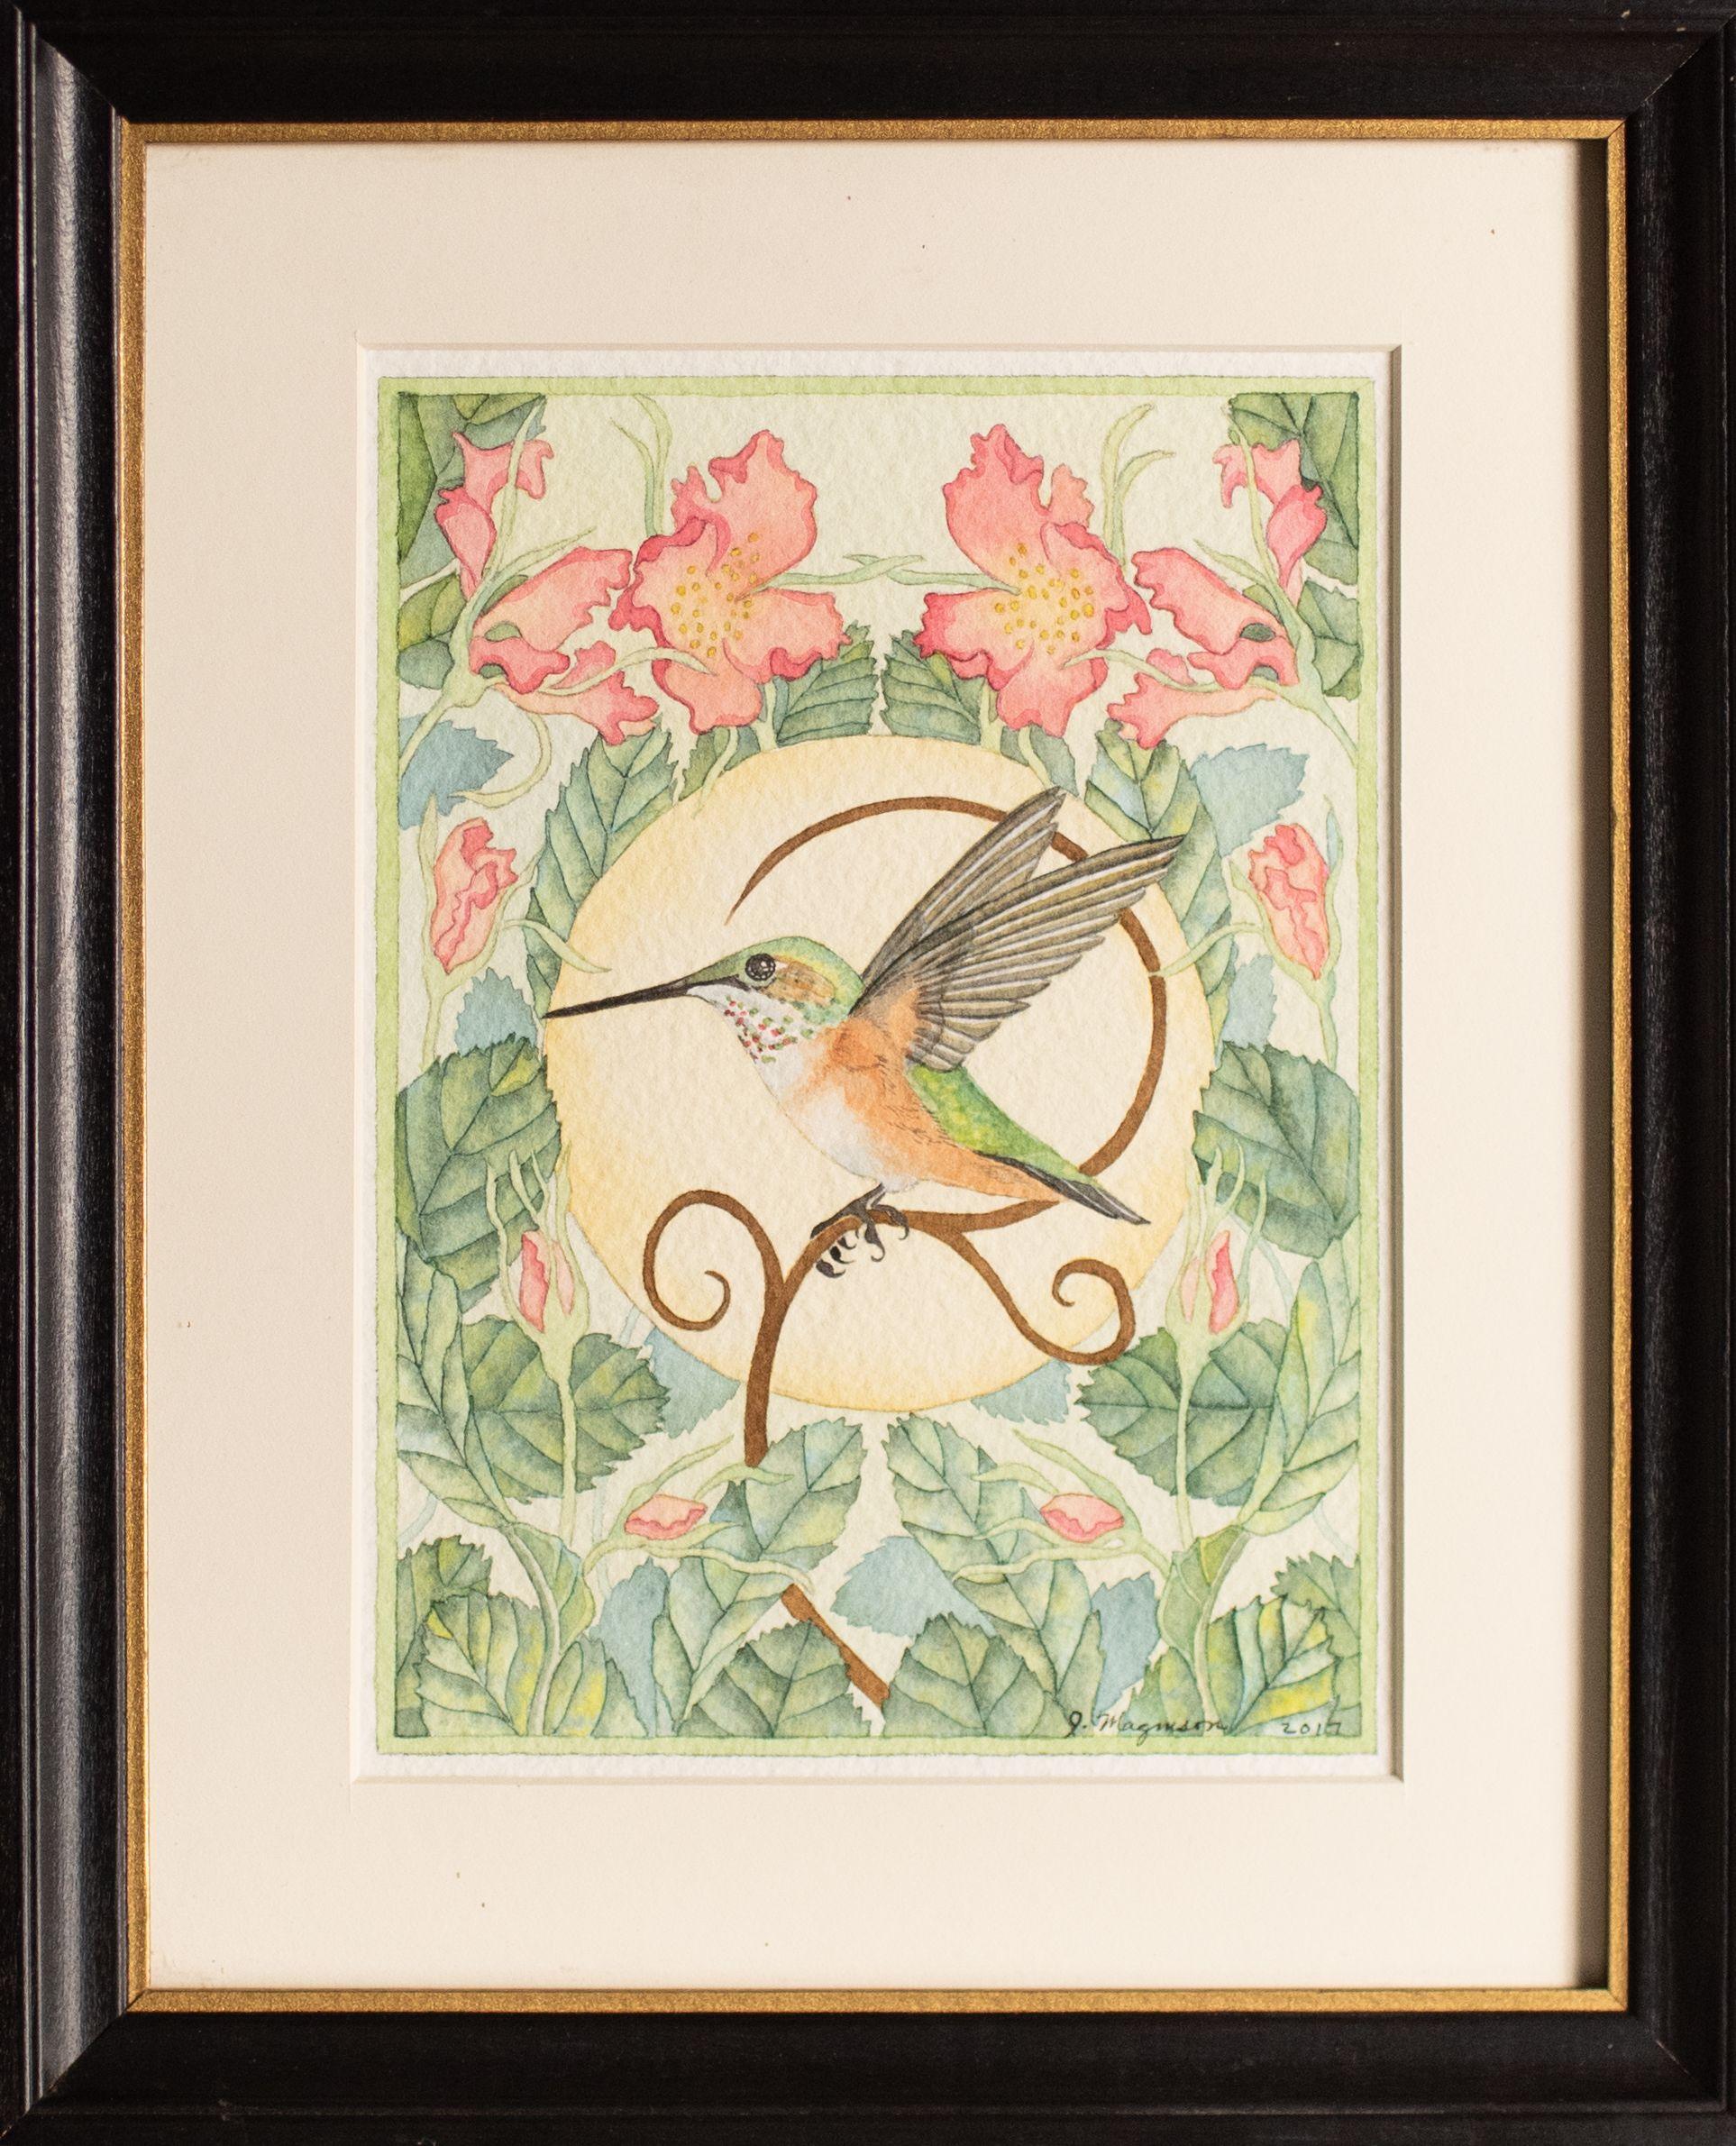 Hummingbird with Wild Roses